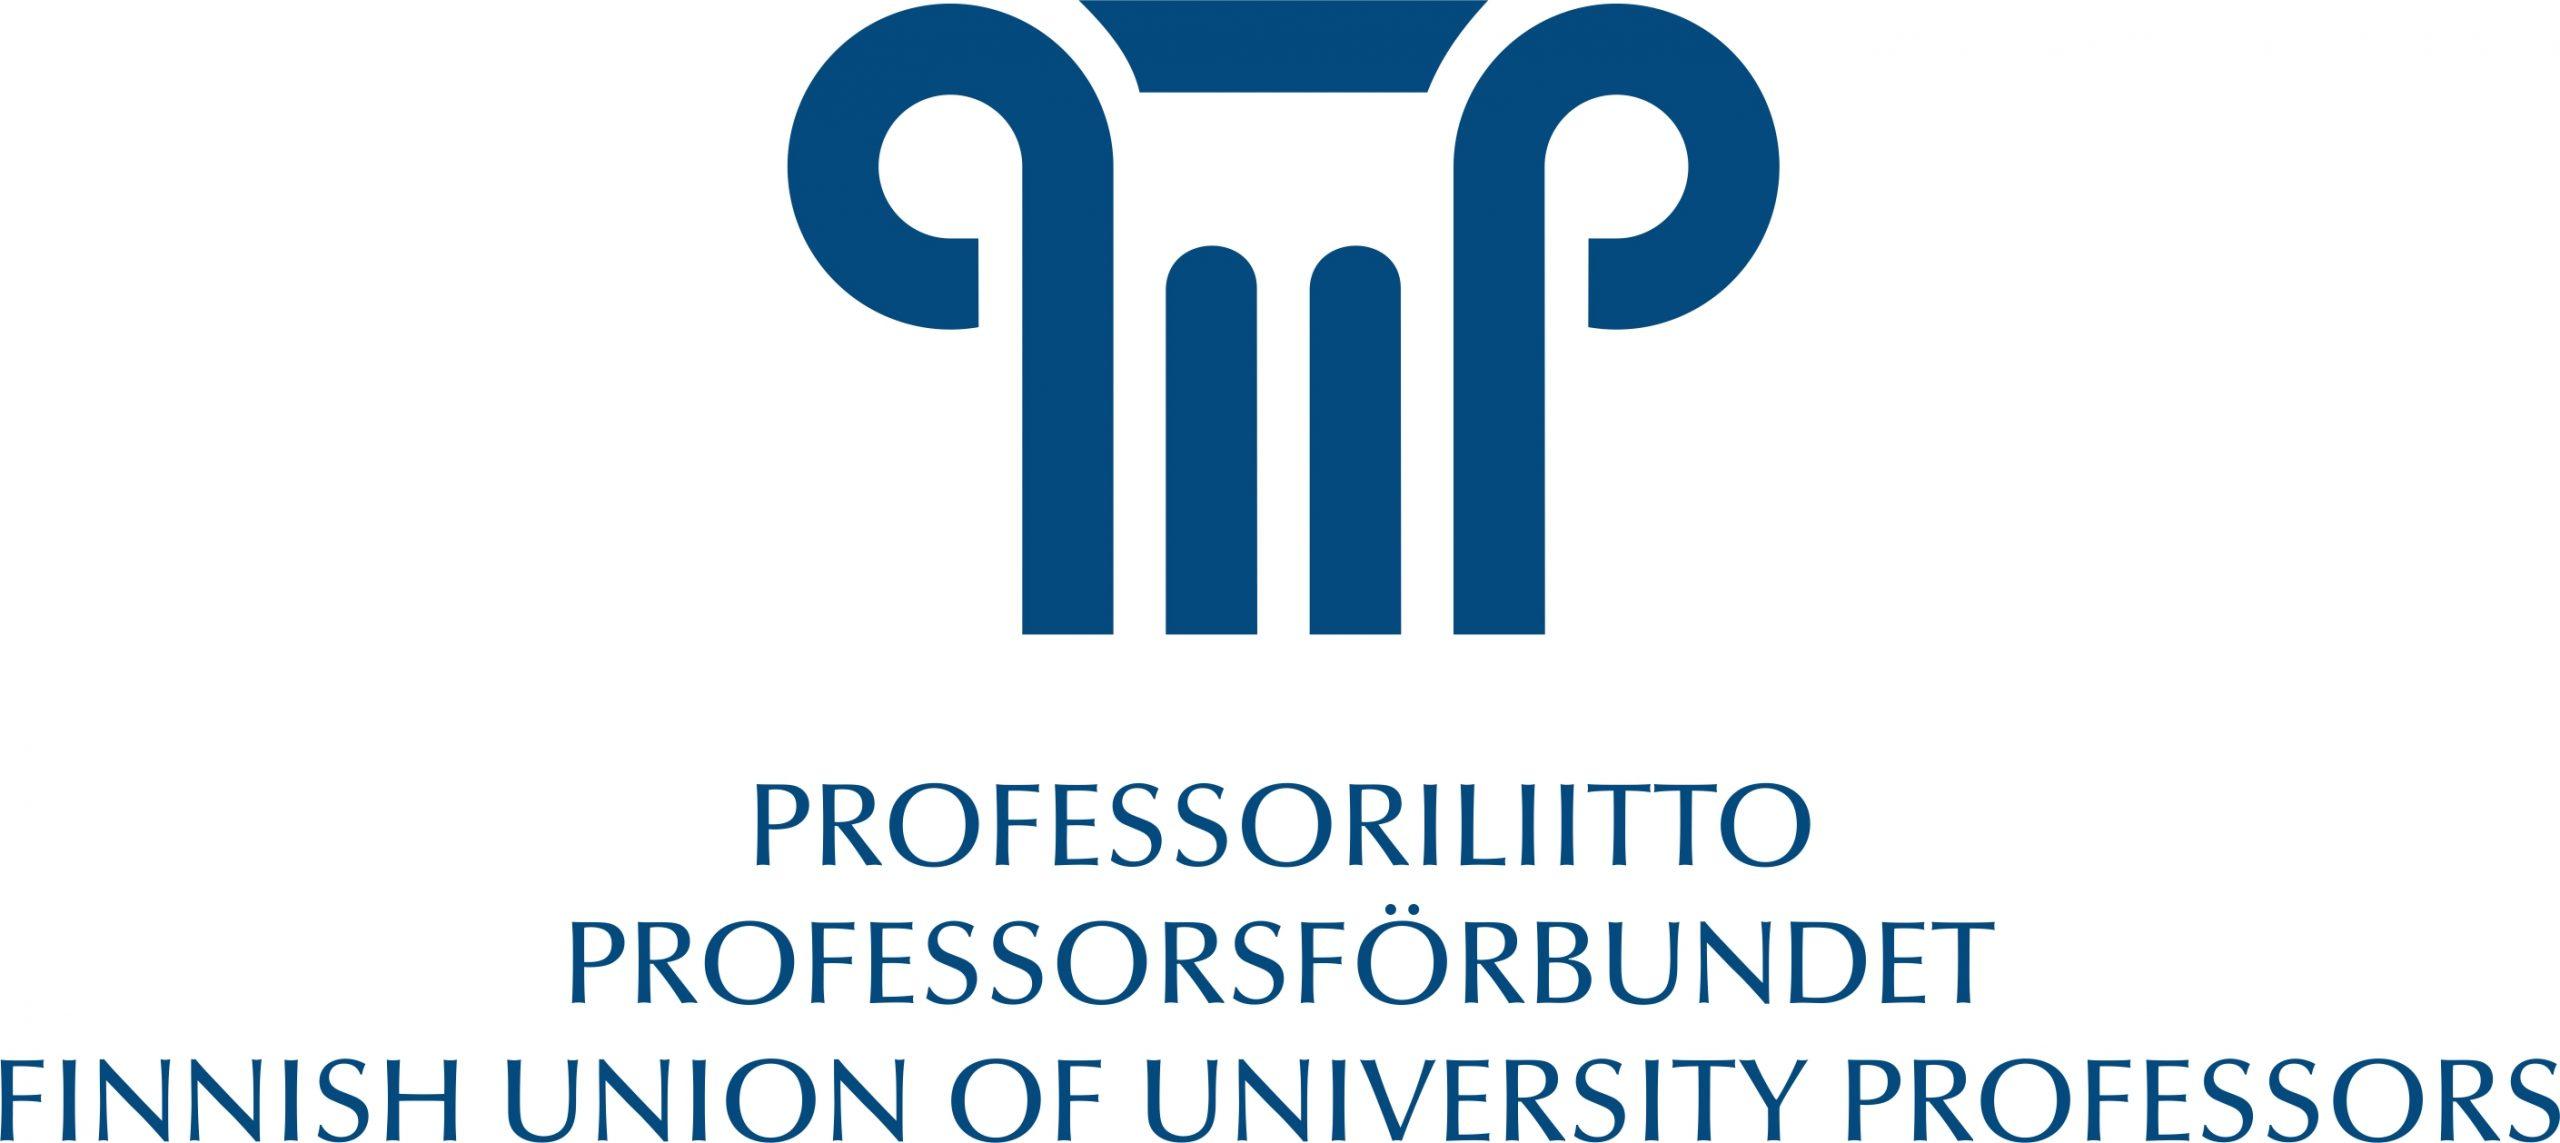 professoriliitto_logo_rgb-jpeg